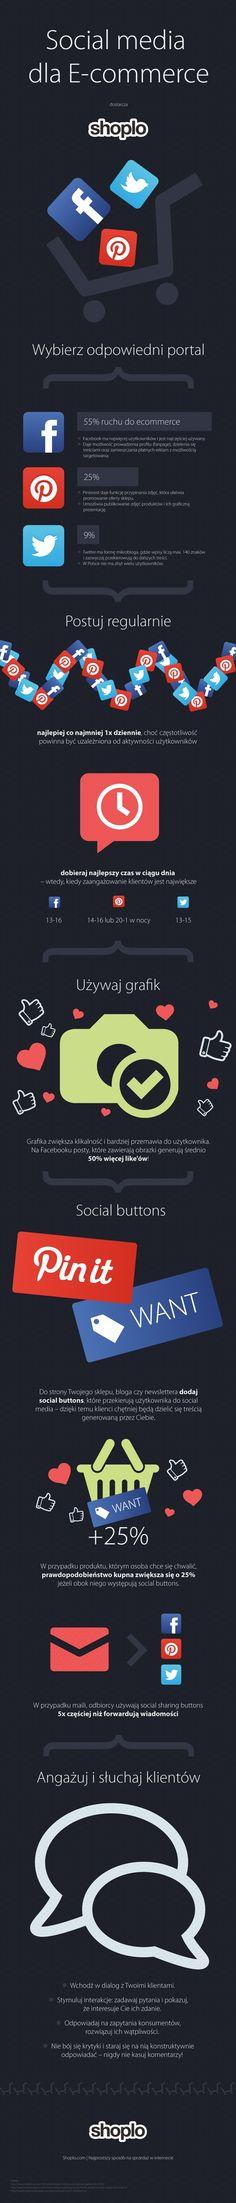 social-media-infografika.jpg (620×5788)